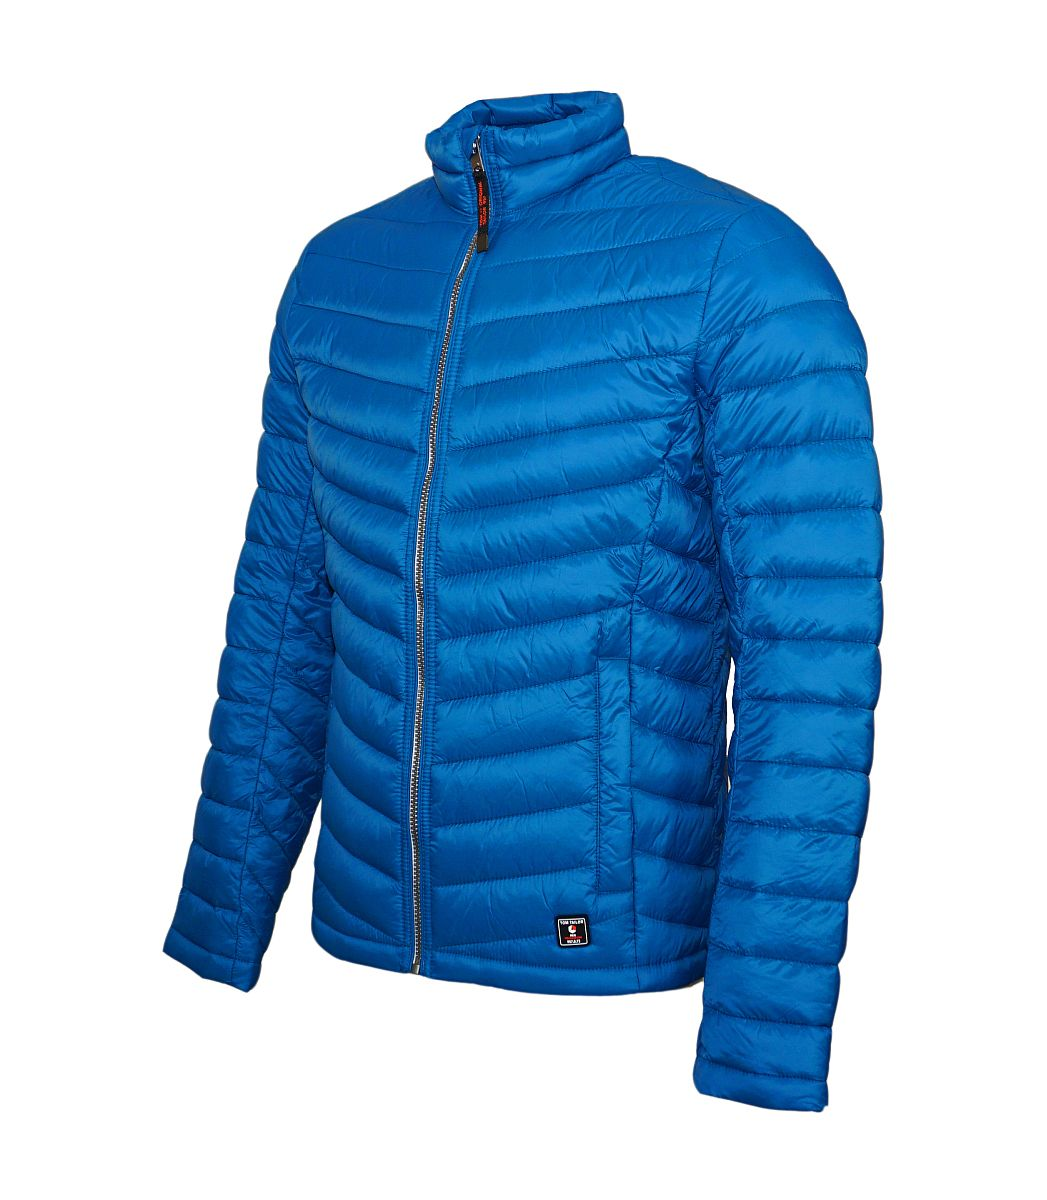 TTJ1 blau Tom 3533475 Jacke Lightweight 6343 SH17 Tailor Daunenjacke Jacket 0110 QWxedCrBo